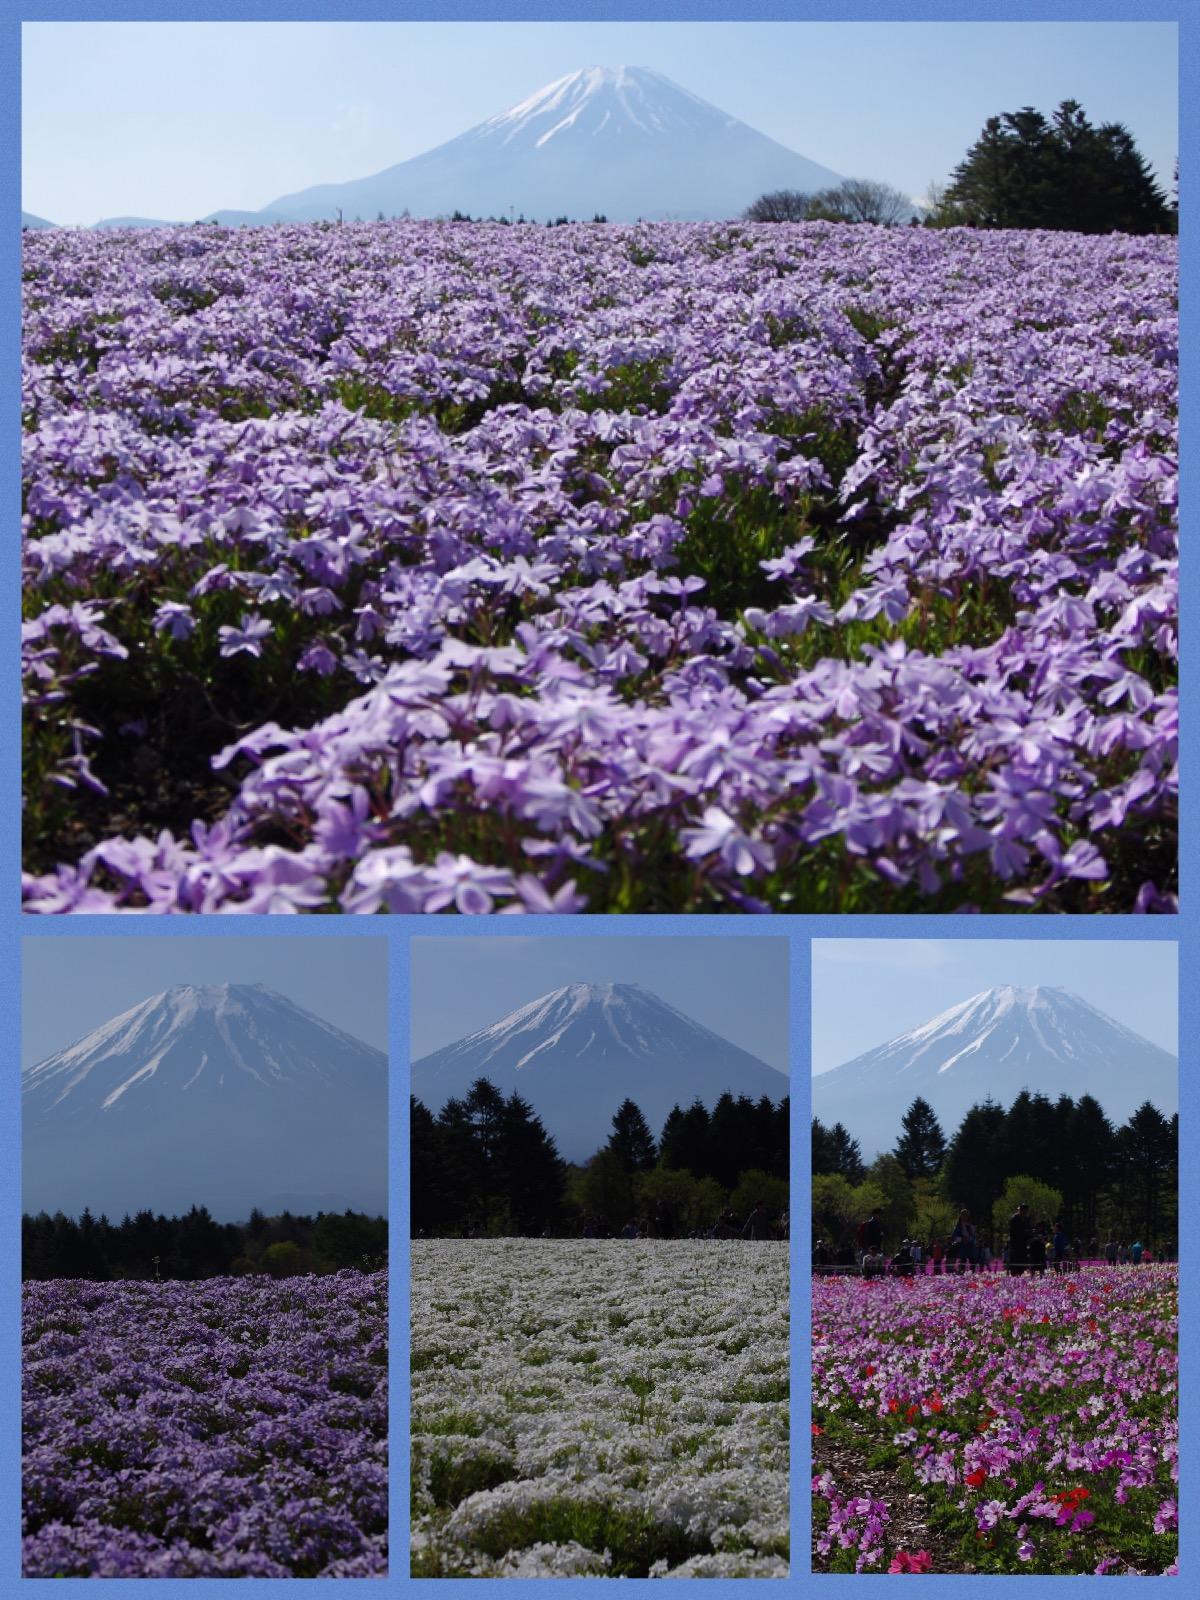 富士芝桜祭り 本栖湖 2016